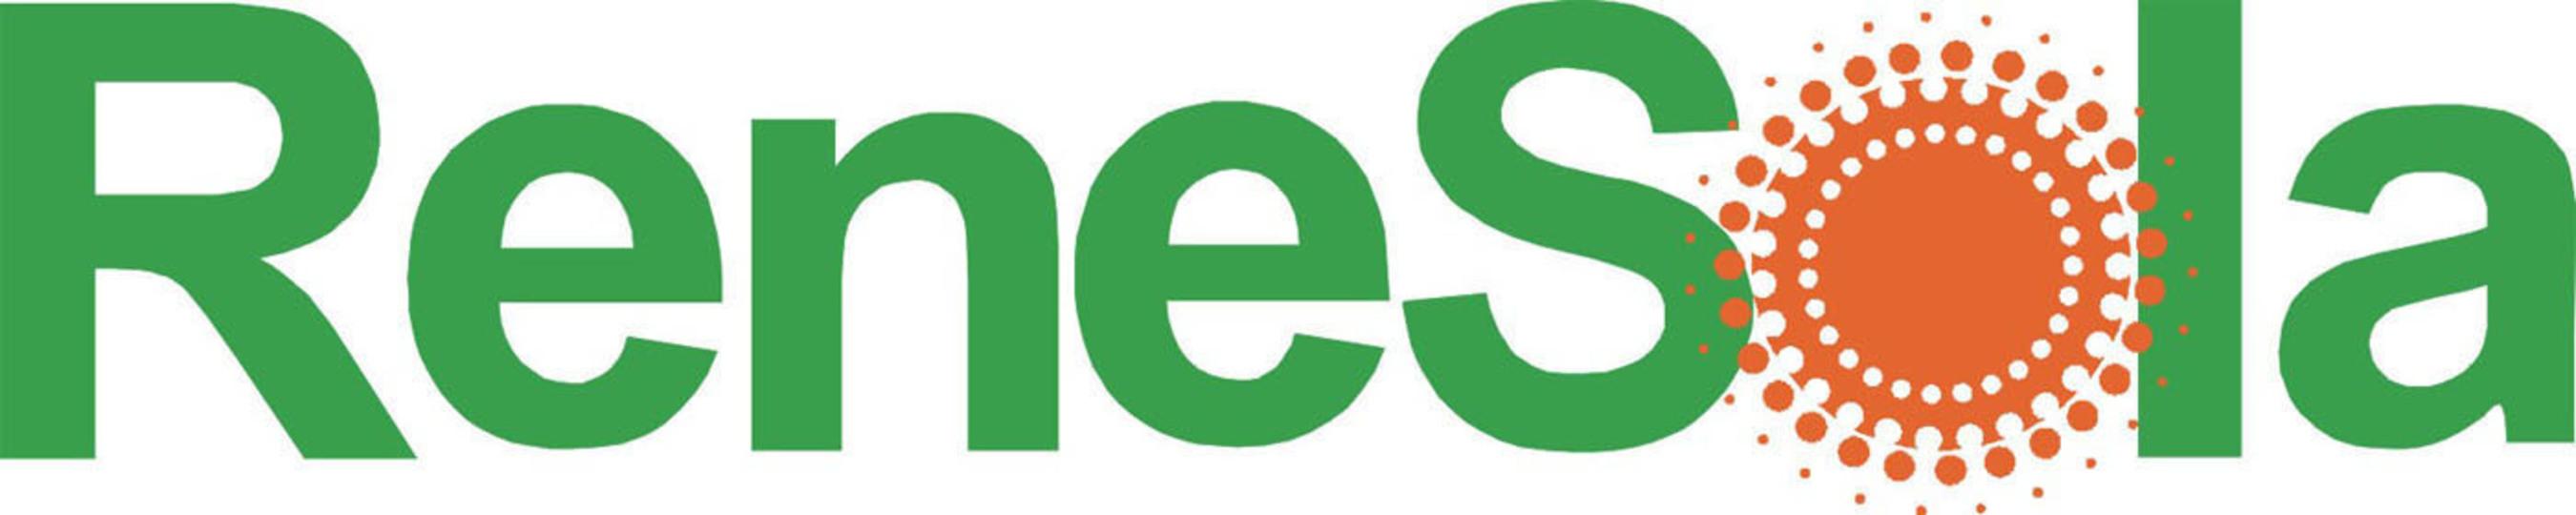 ReneSola Logo. (PRNewsFoto/ReneSola Ltd) (PRNewsFoto/)